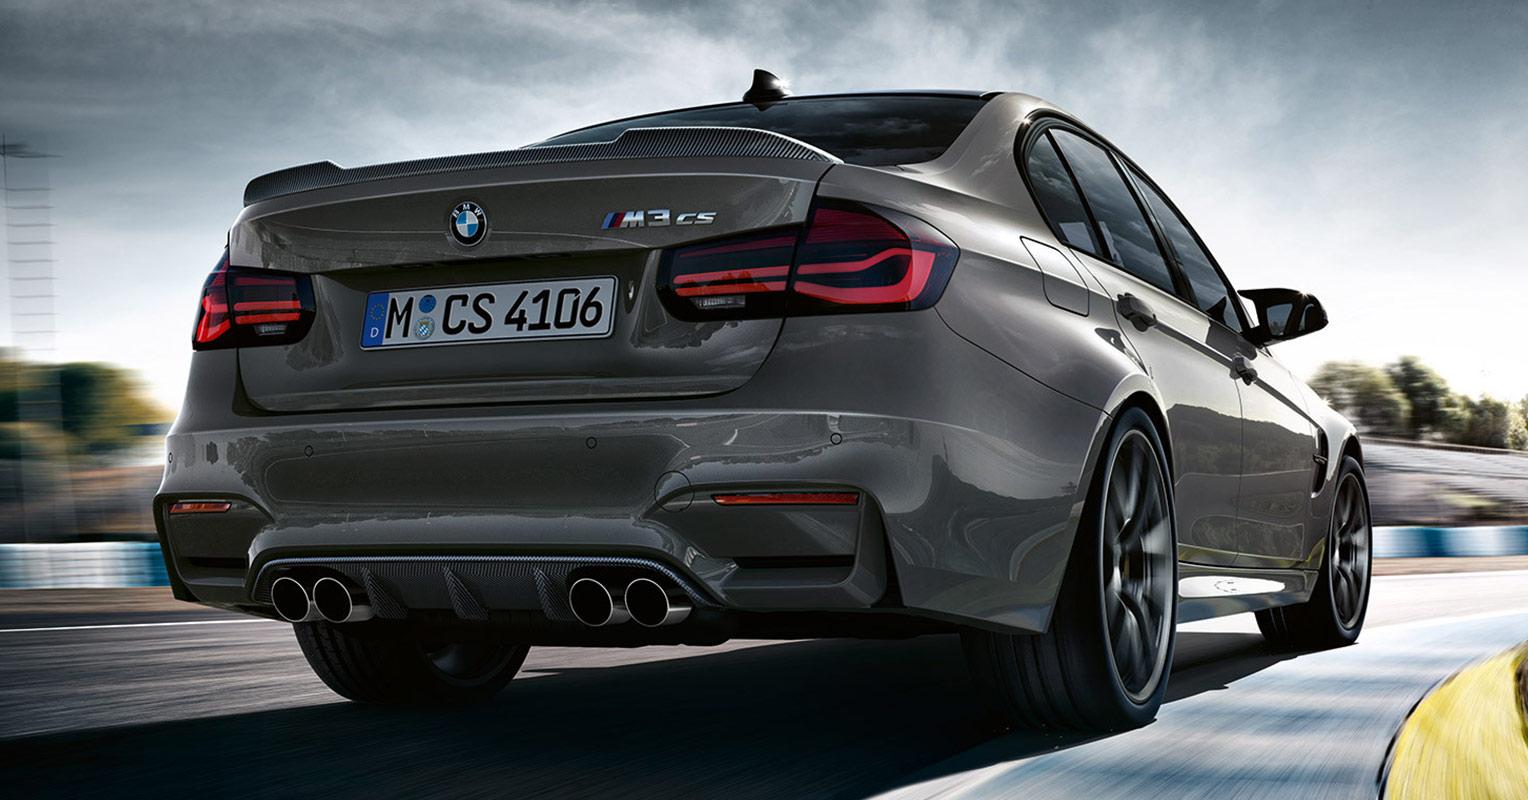 Trasera del BMW M3 CS